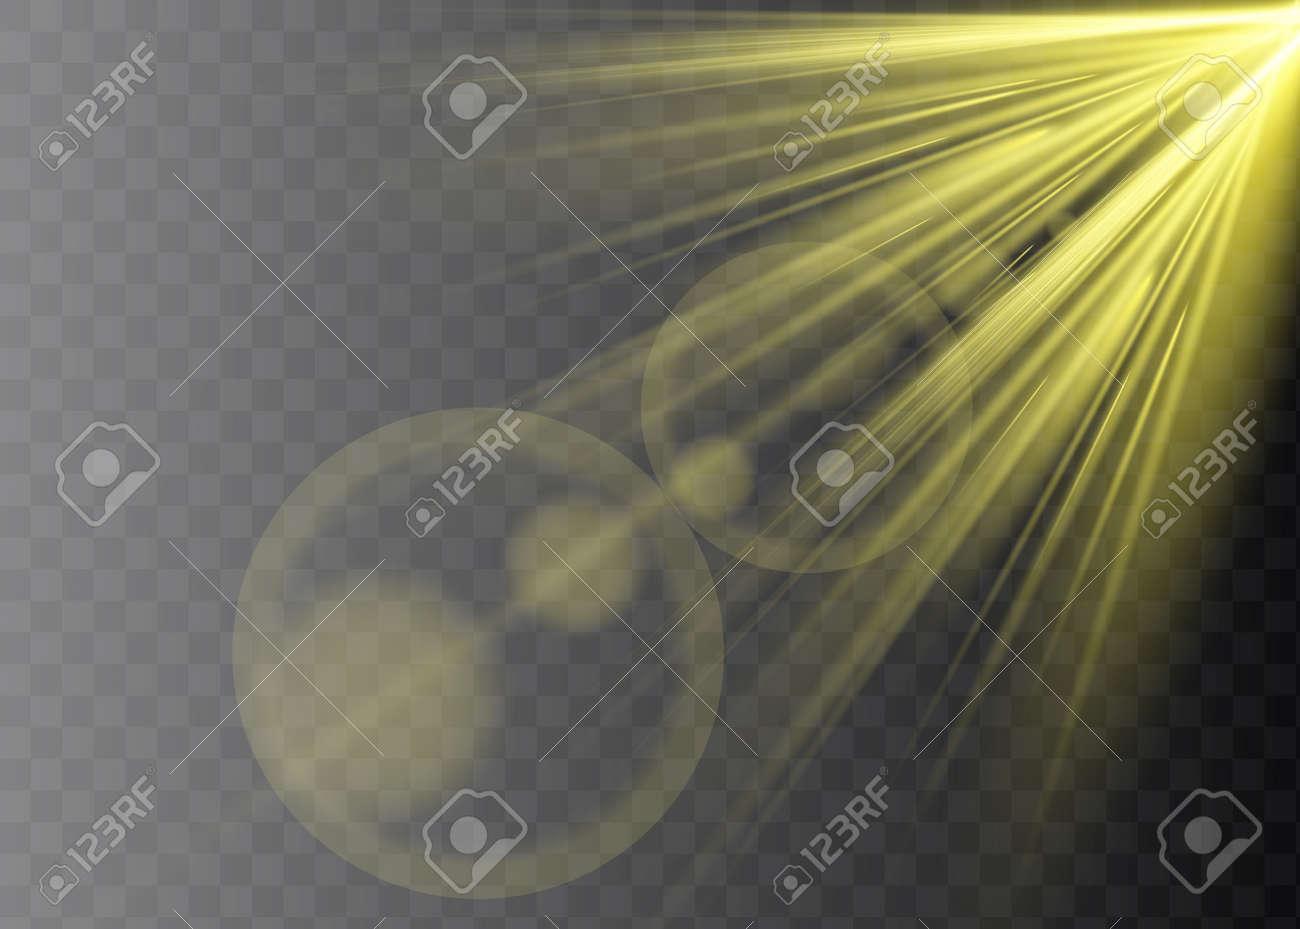 Vector transparent sunlight special lens flare light effect - 169712026